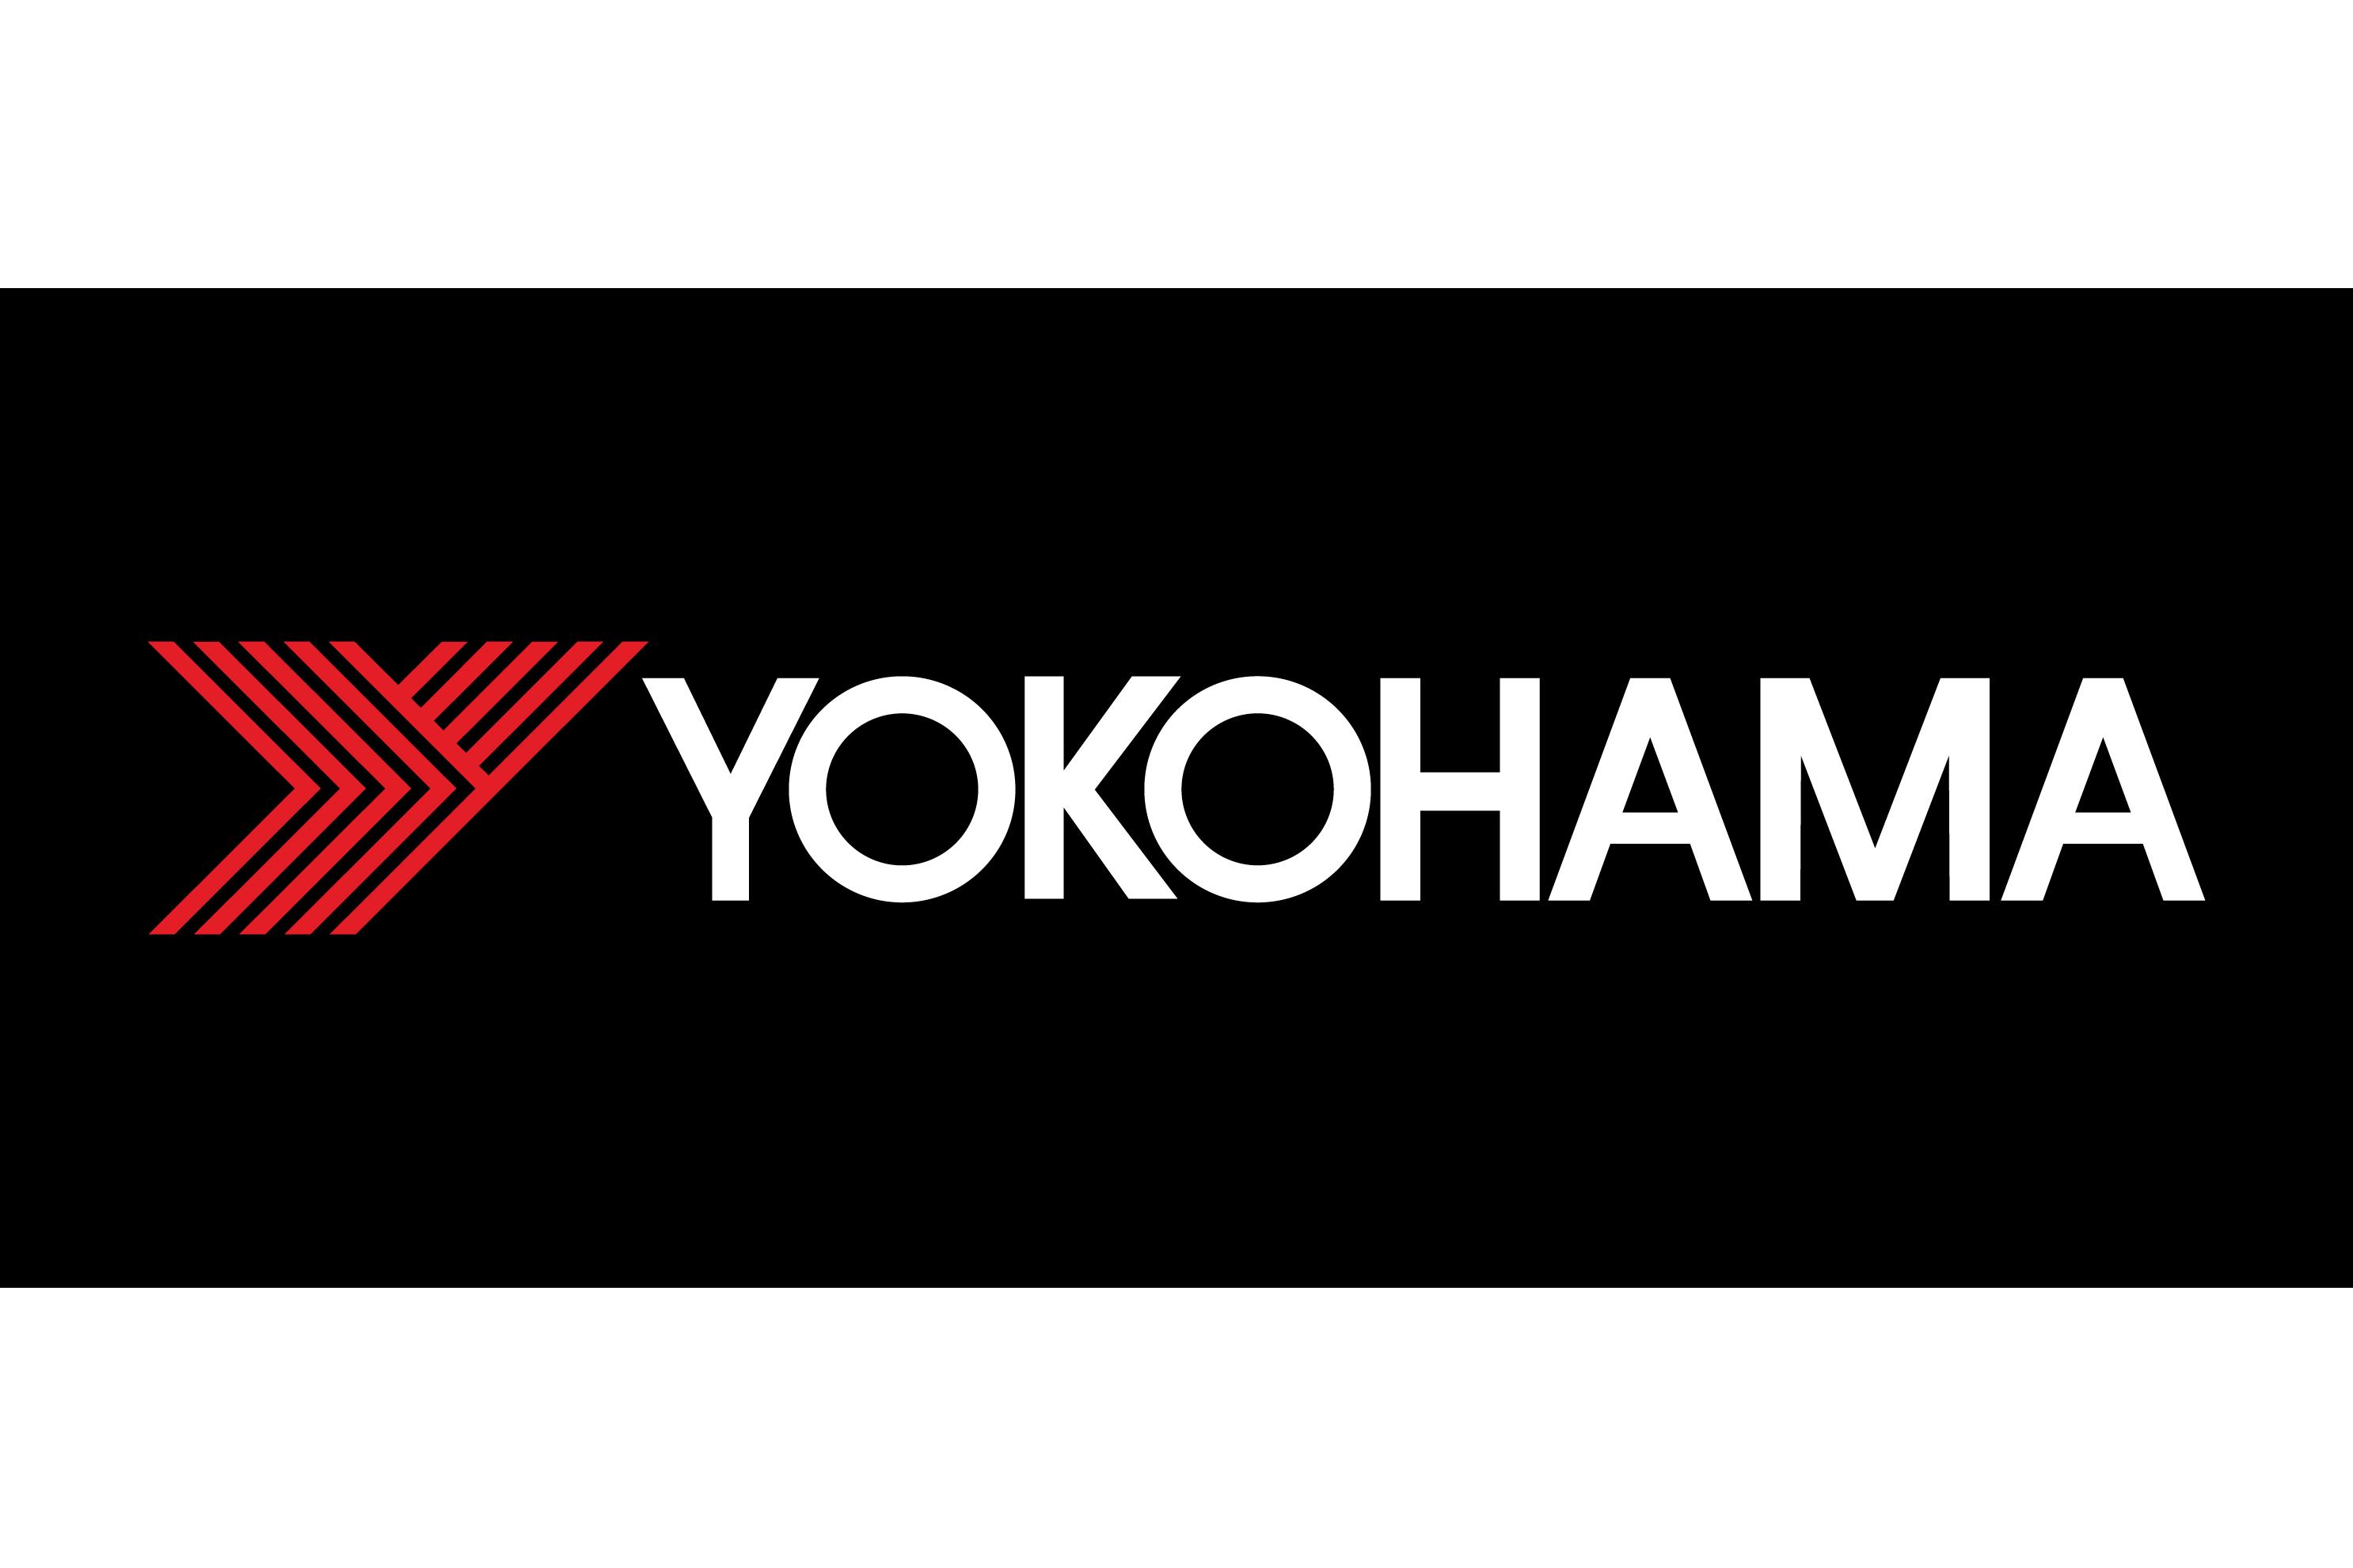 YOKOHAMA_black_logo